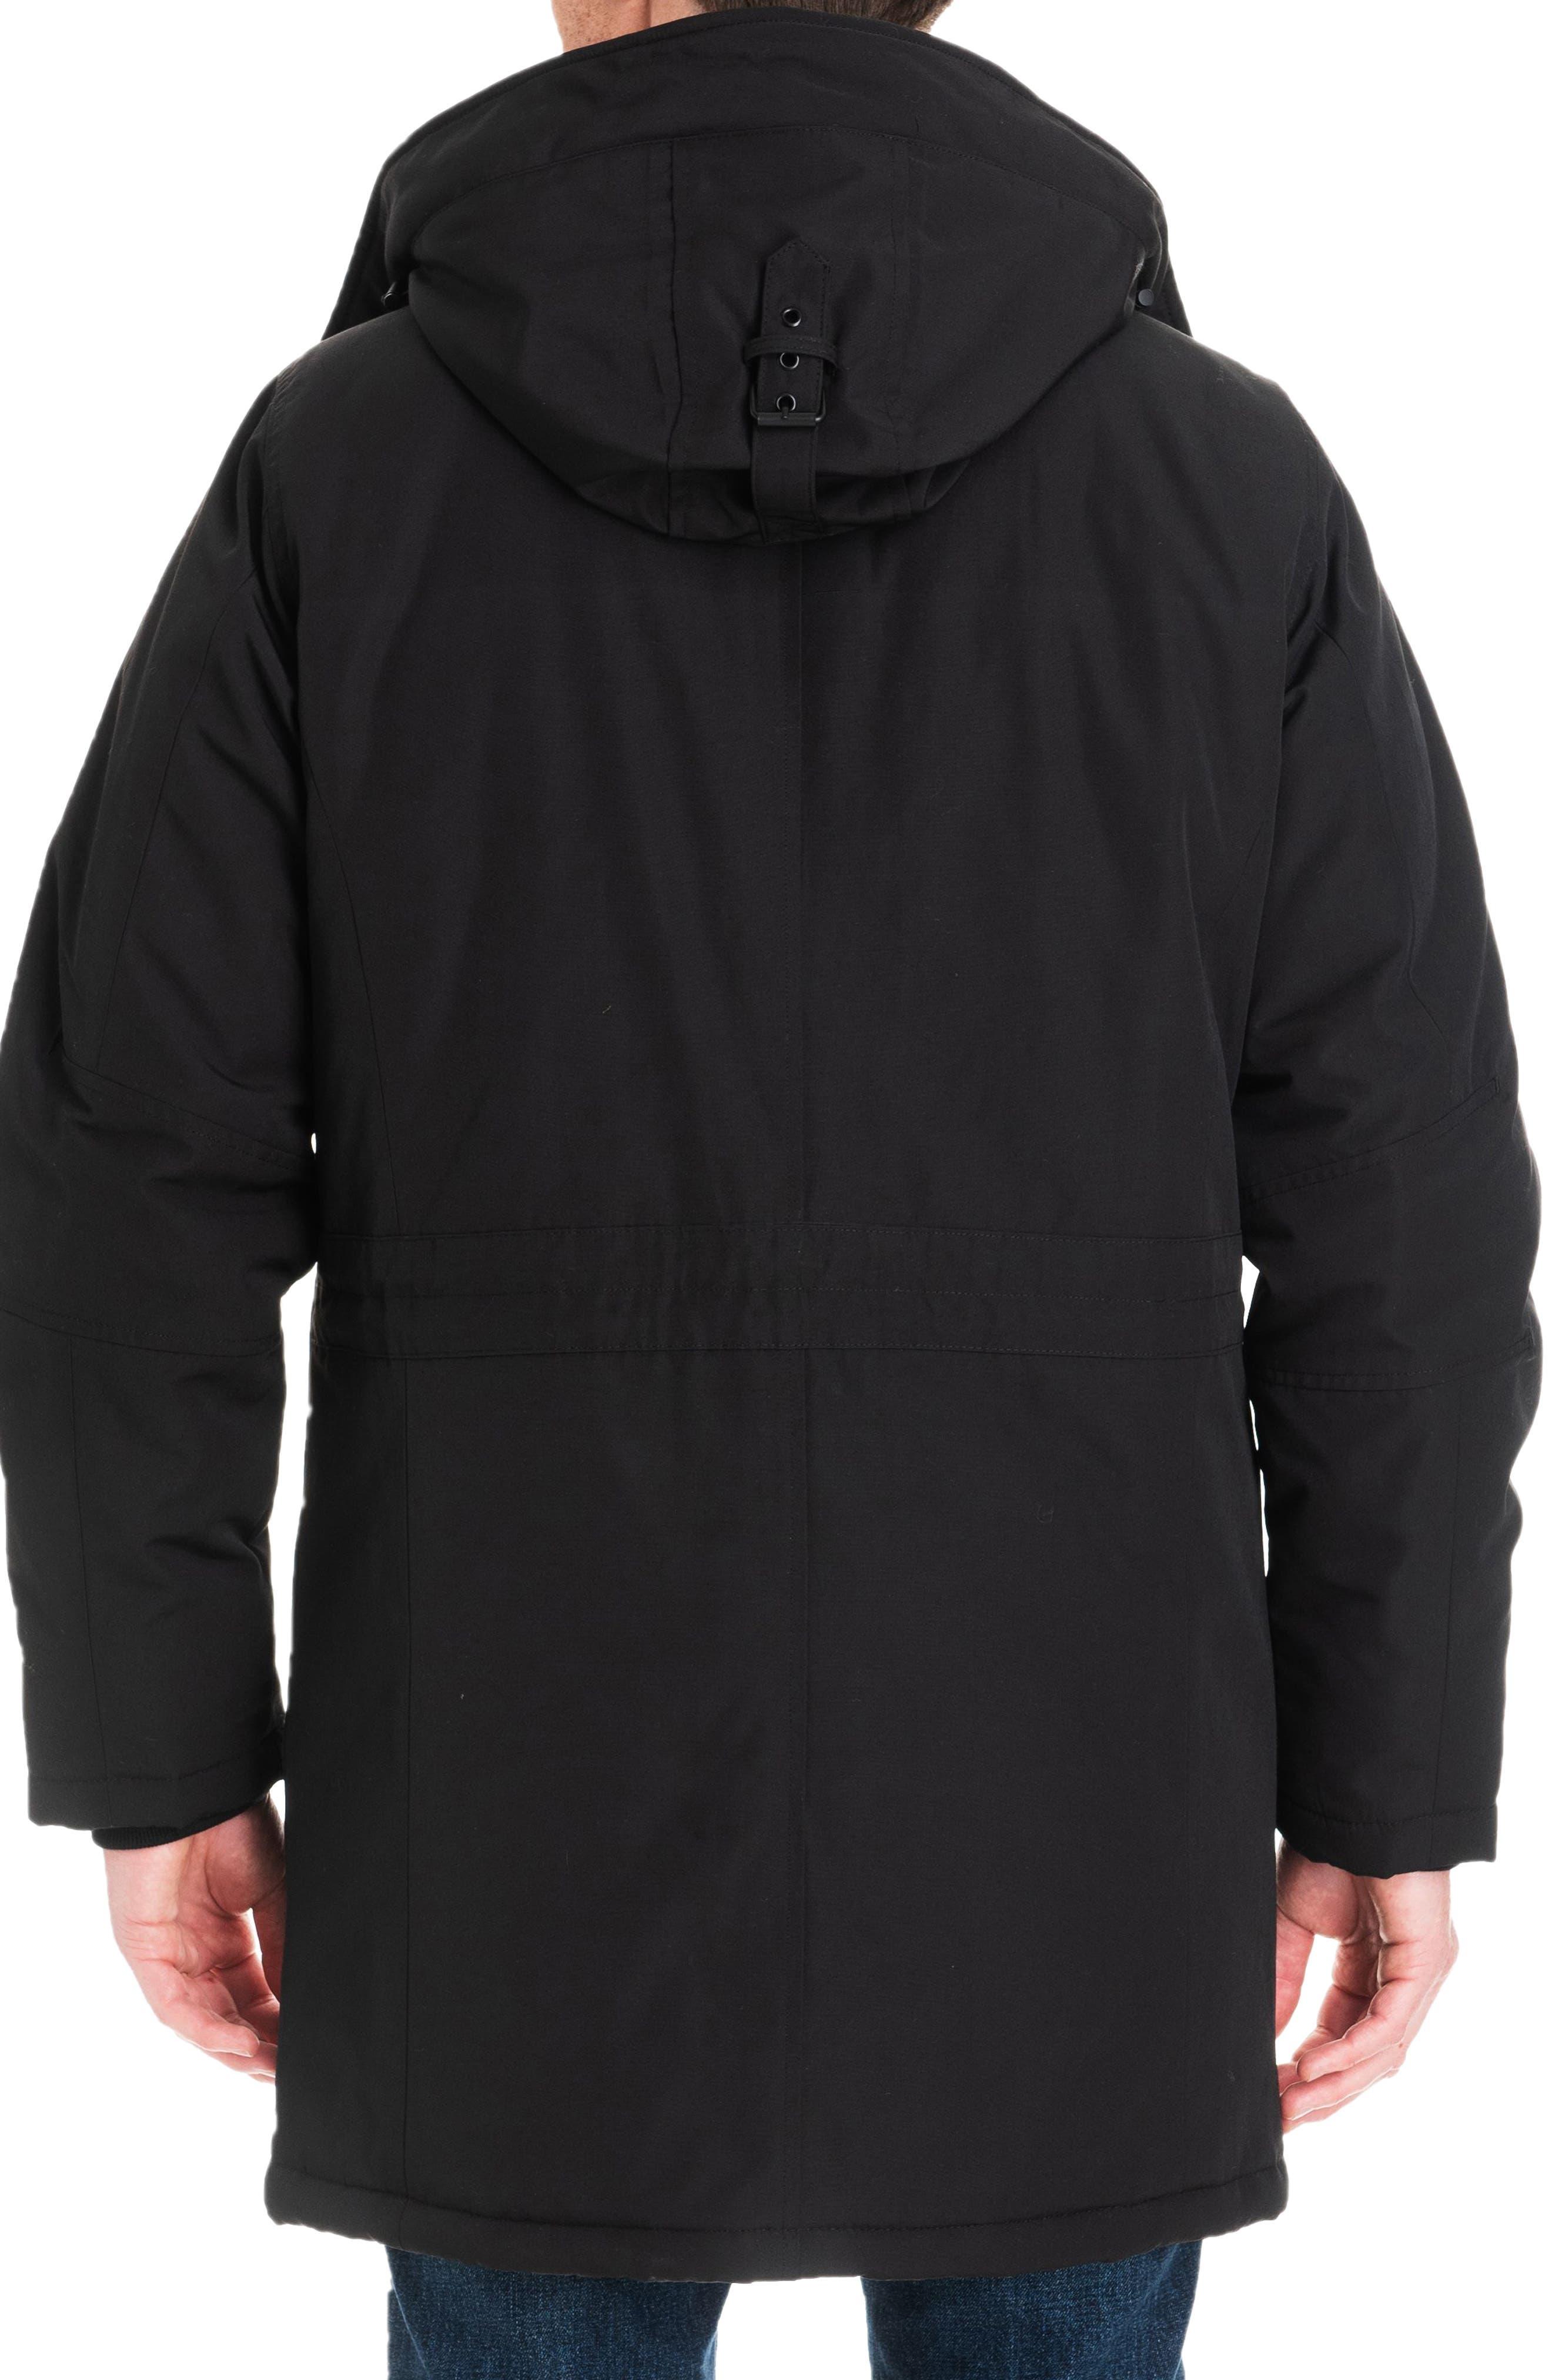 Gardiner Water Resistant Snorkel Coat,                             Alternate thumbnail 2, color,                             BLACK/ MIDNIGHT